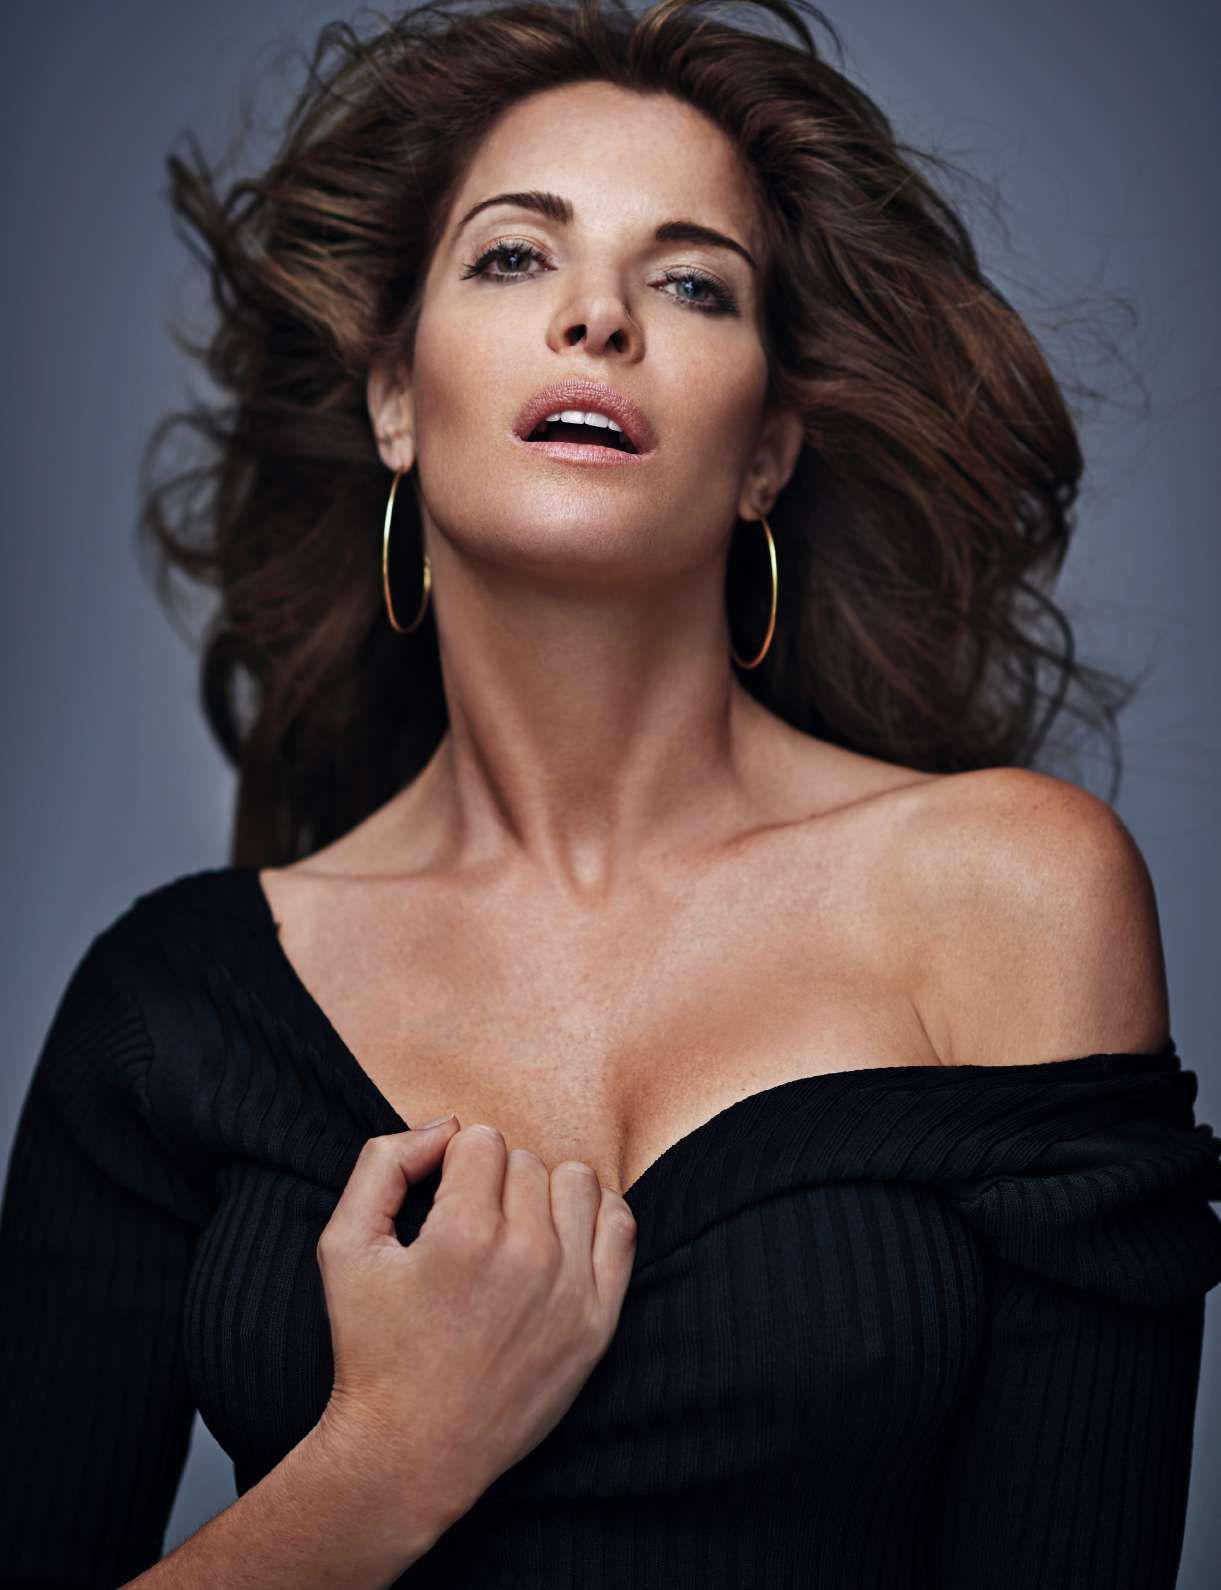 Smile: Stephanie Seymour in Elle Spain October 2016 by ...